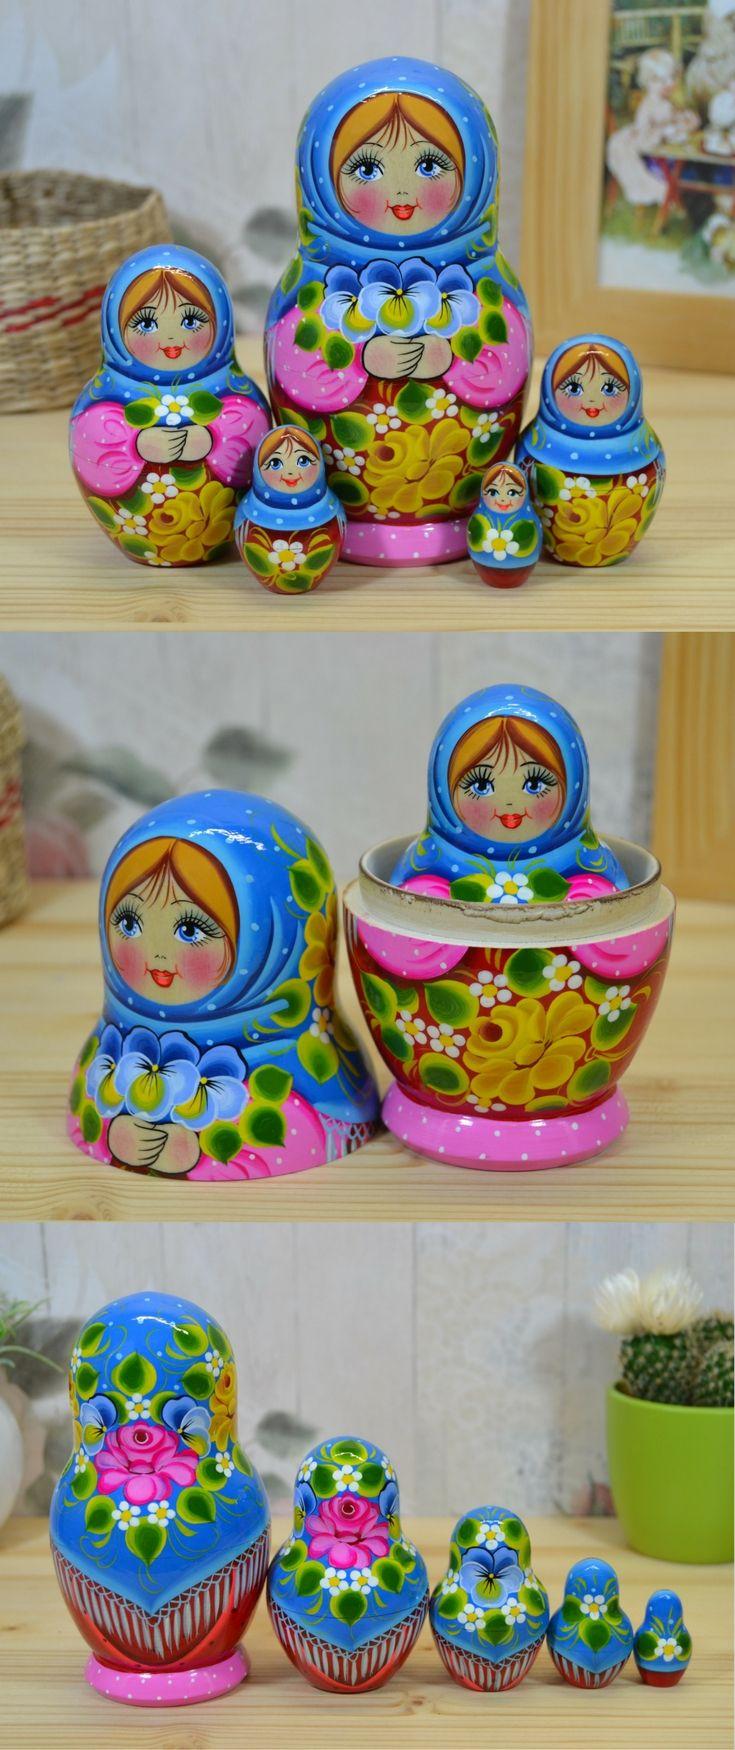 russian babushka doll in blue shawl